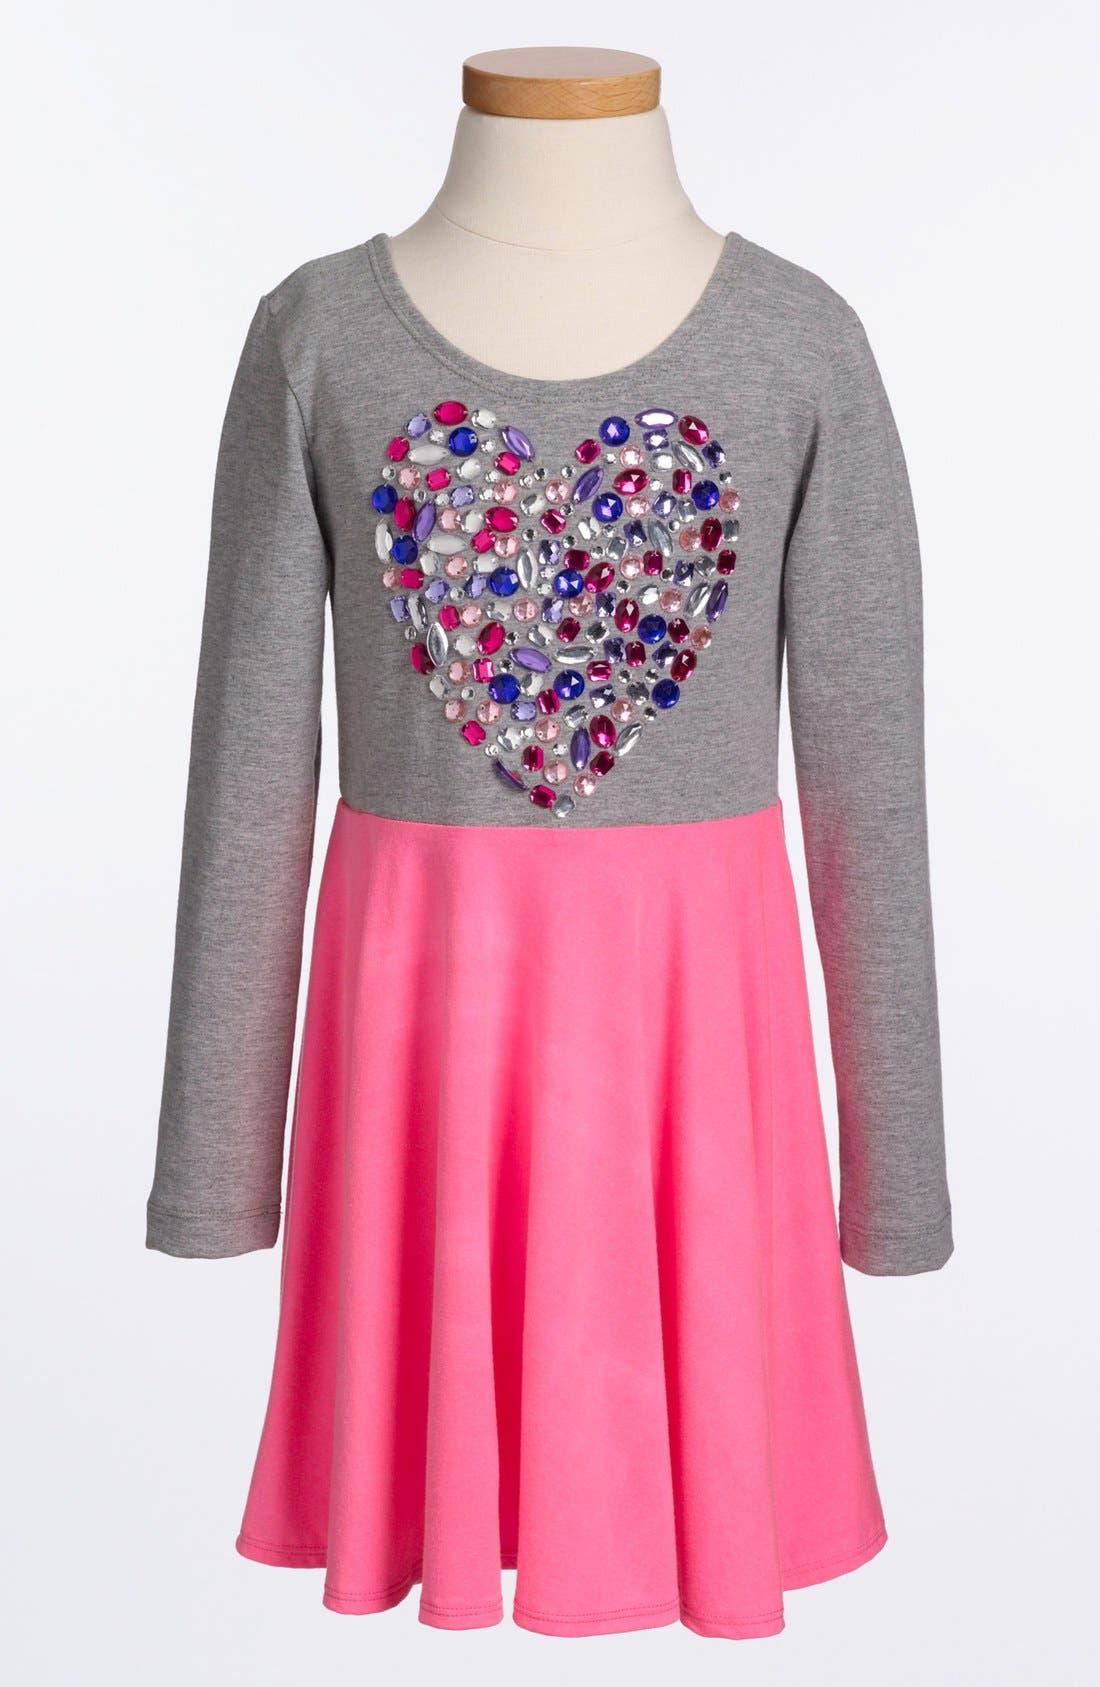 Alternate Image 1 Selected - Flowers By Zoe Heart Dress (Little Girls & Big Girls) (Online Only)